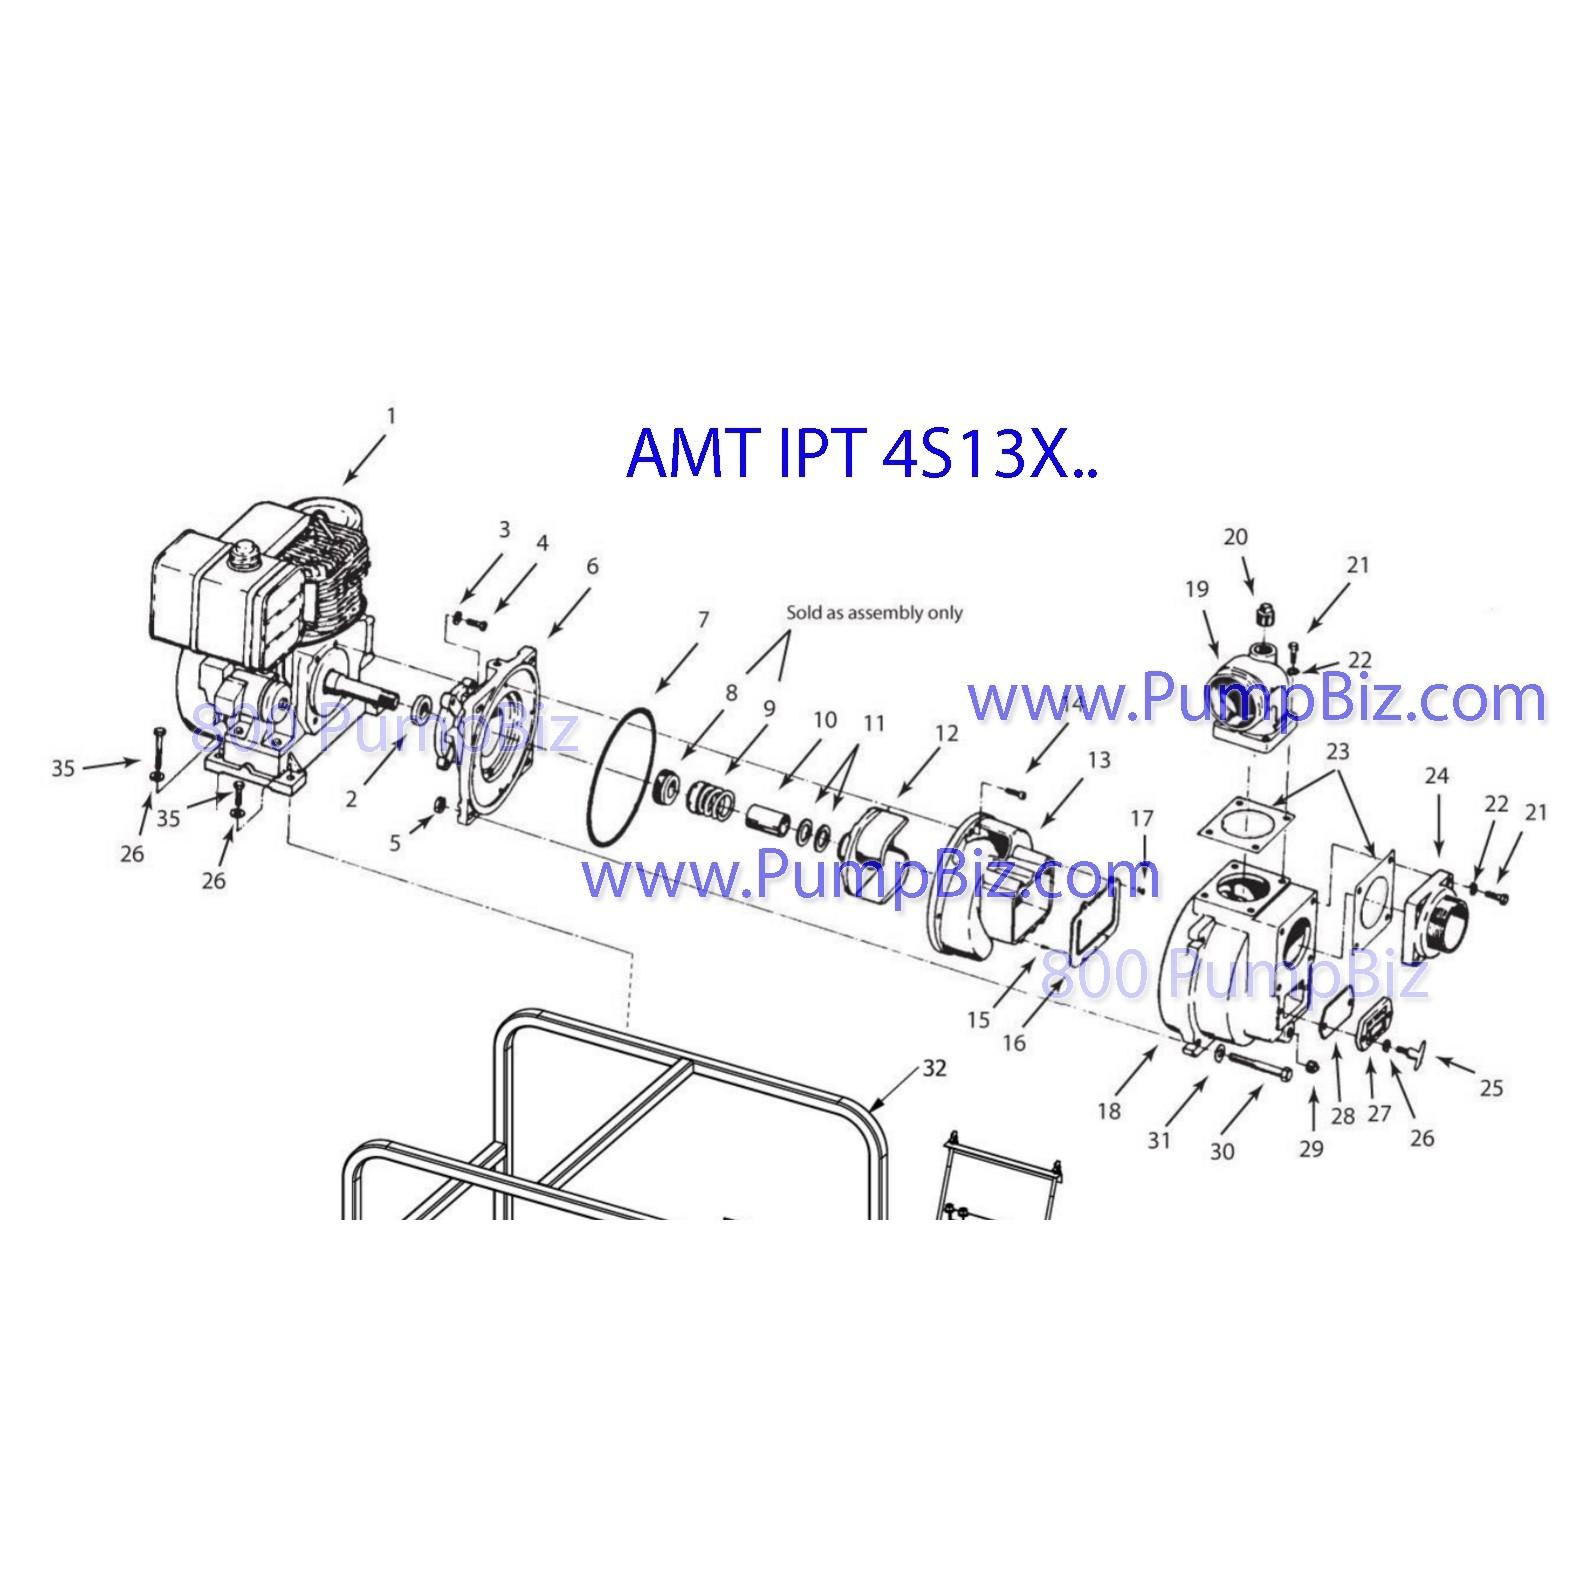 Gx 390 Engine Diagram Electrical Wiring Diagrams Honda Gx390 Electric Start Parts Smart U2022 Cylinder